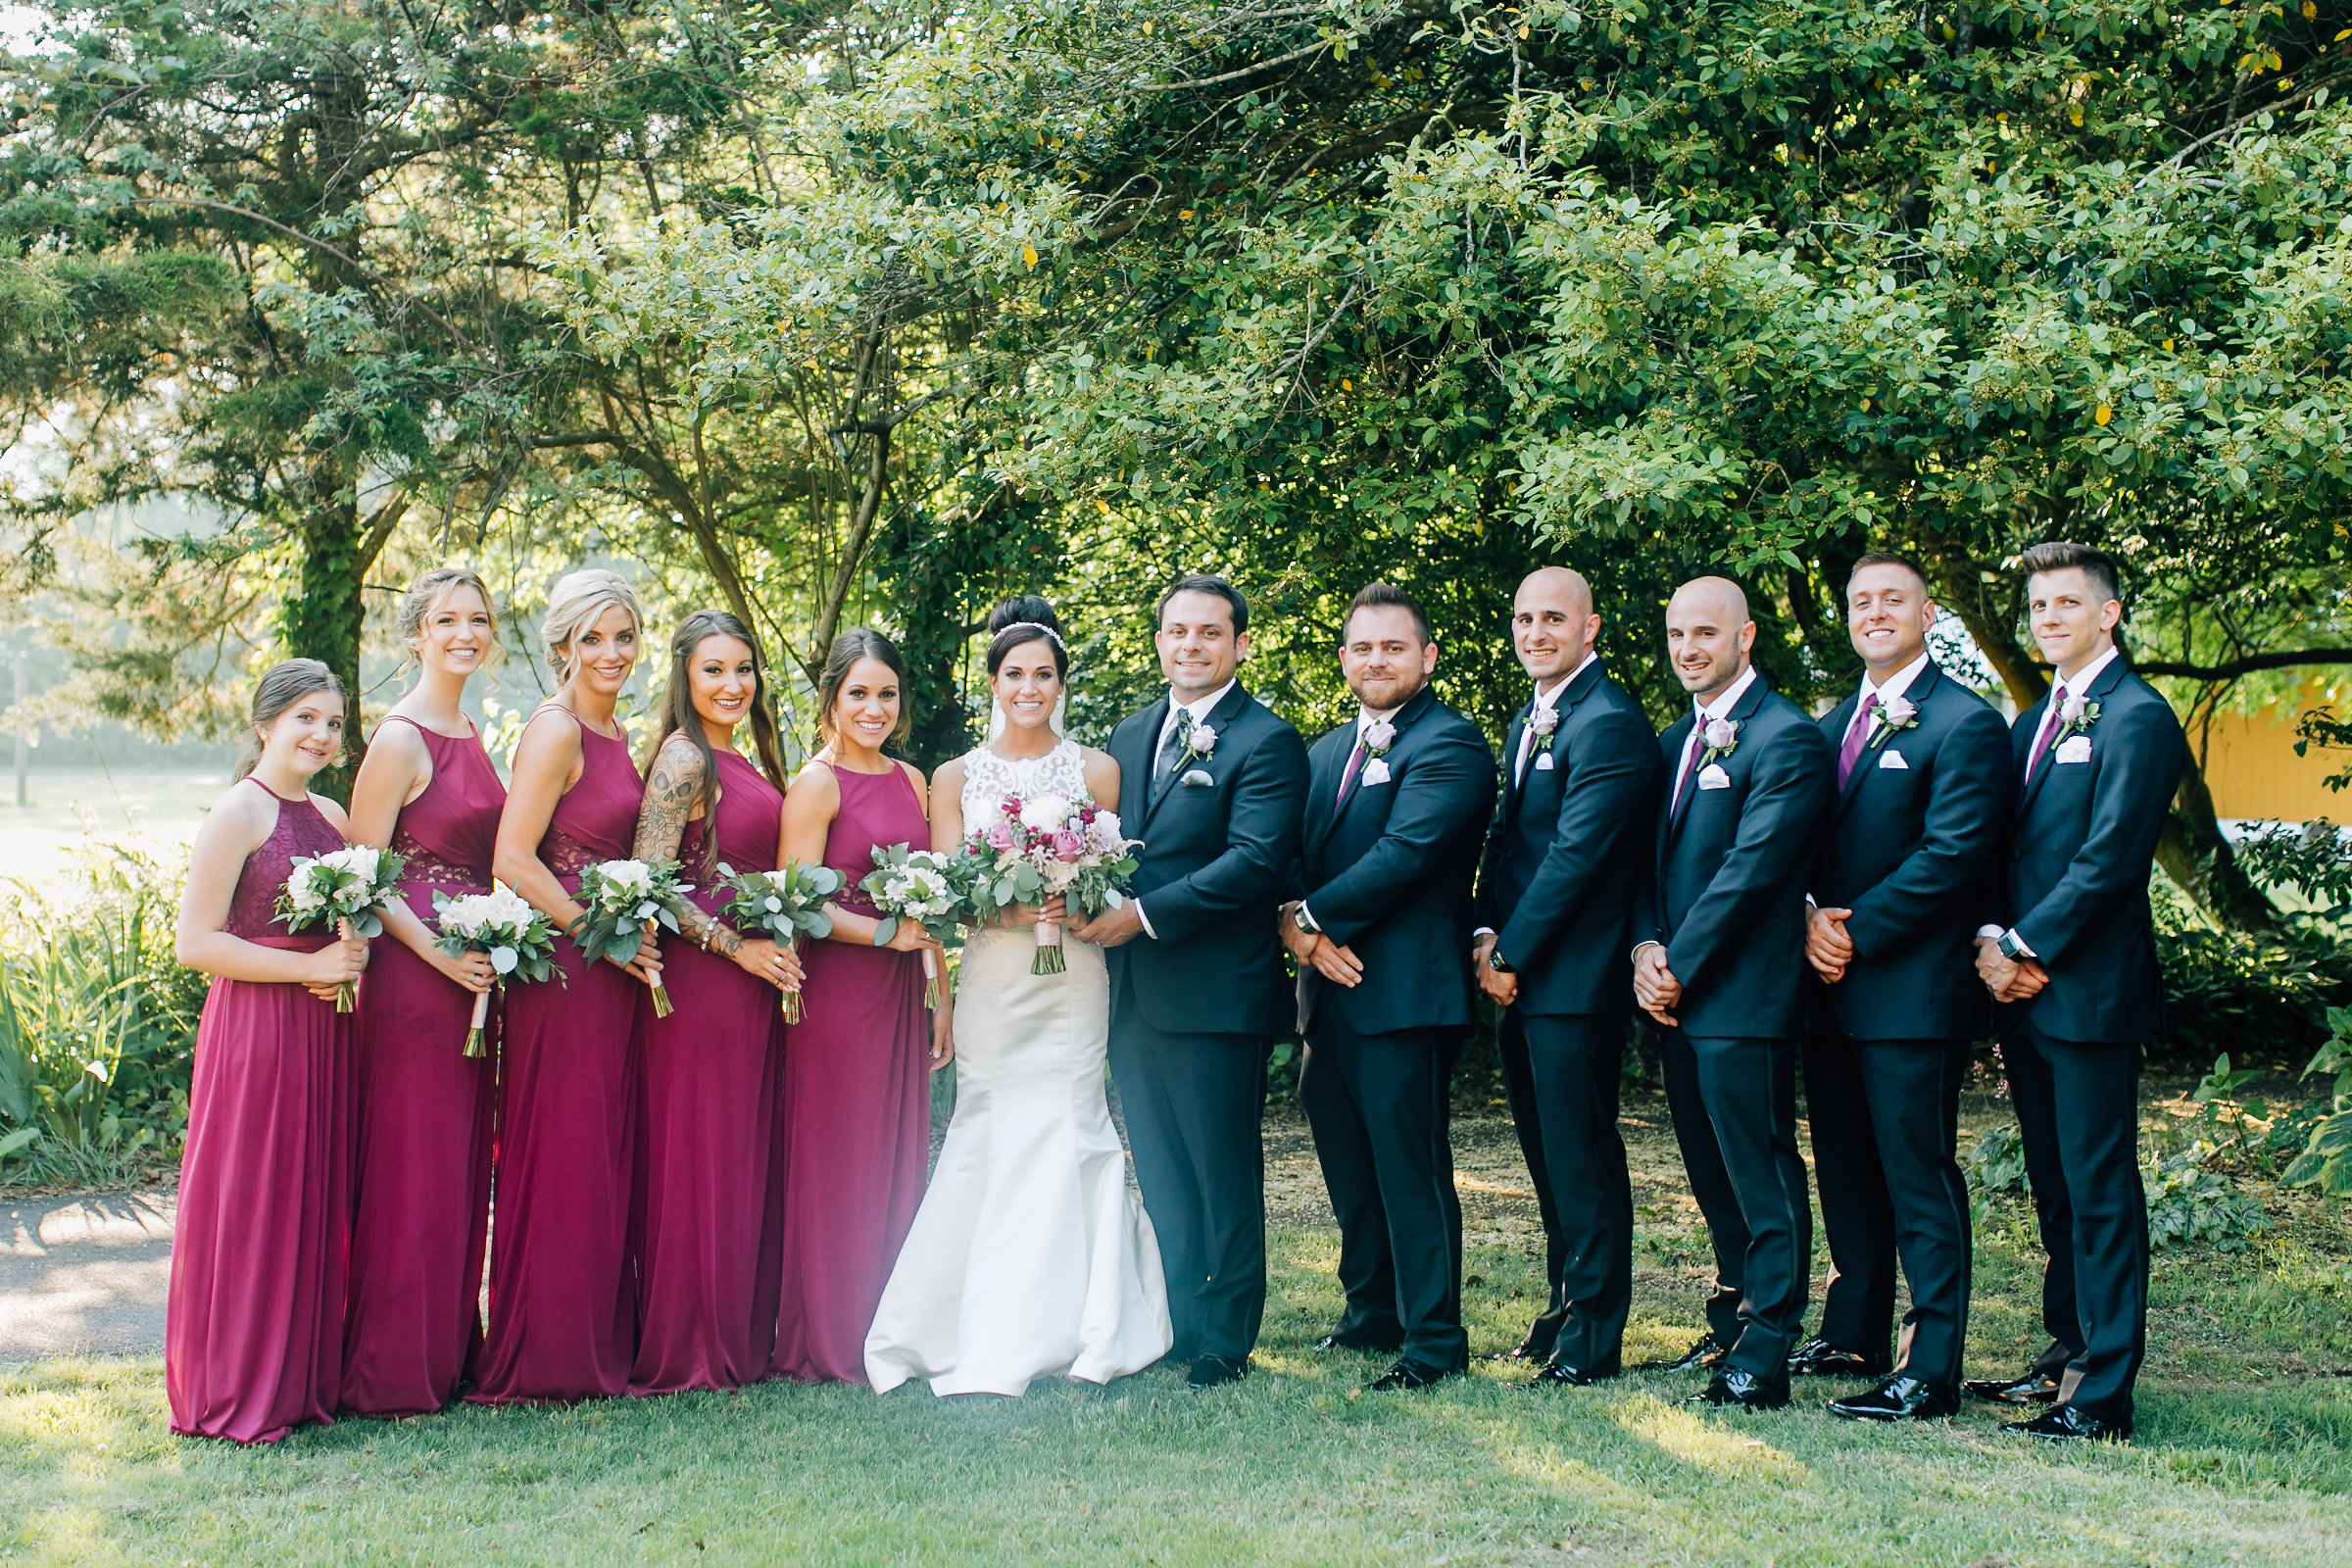 MagdalenaStudios_WeddingPhotographer_WillowCreekWinery_CarissaJoe-361.jpg